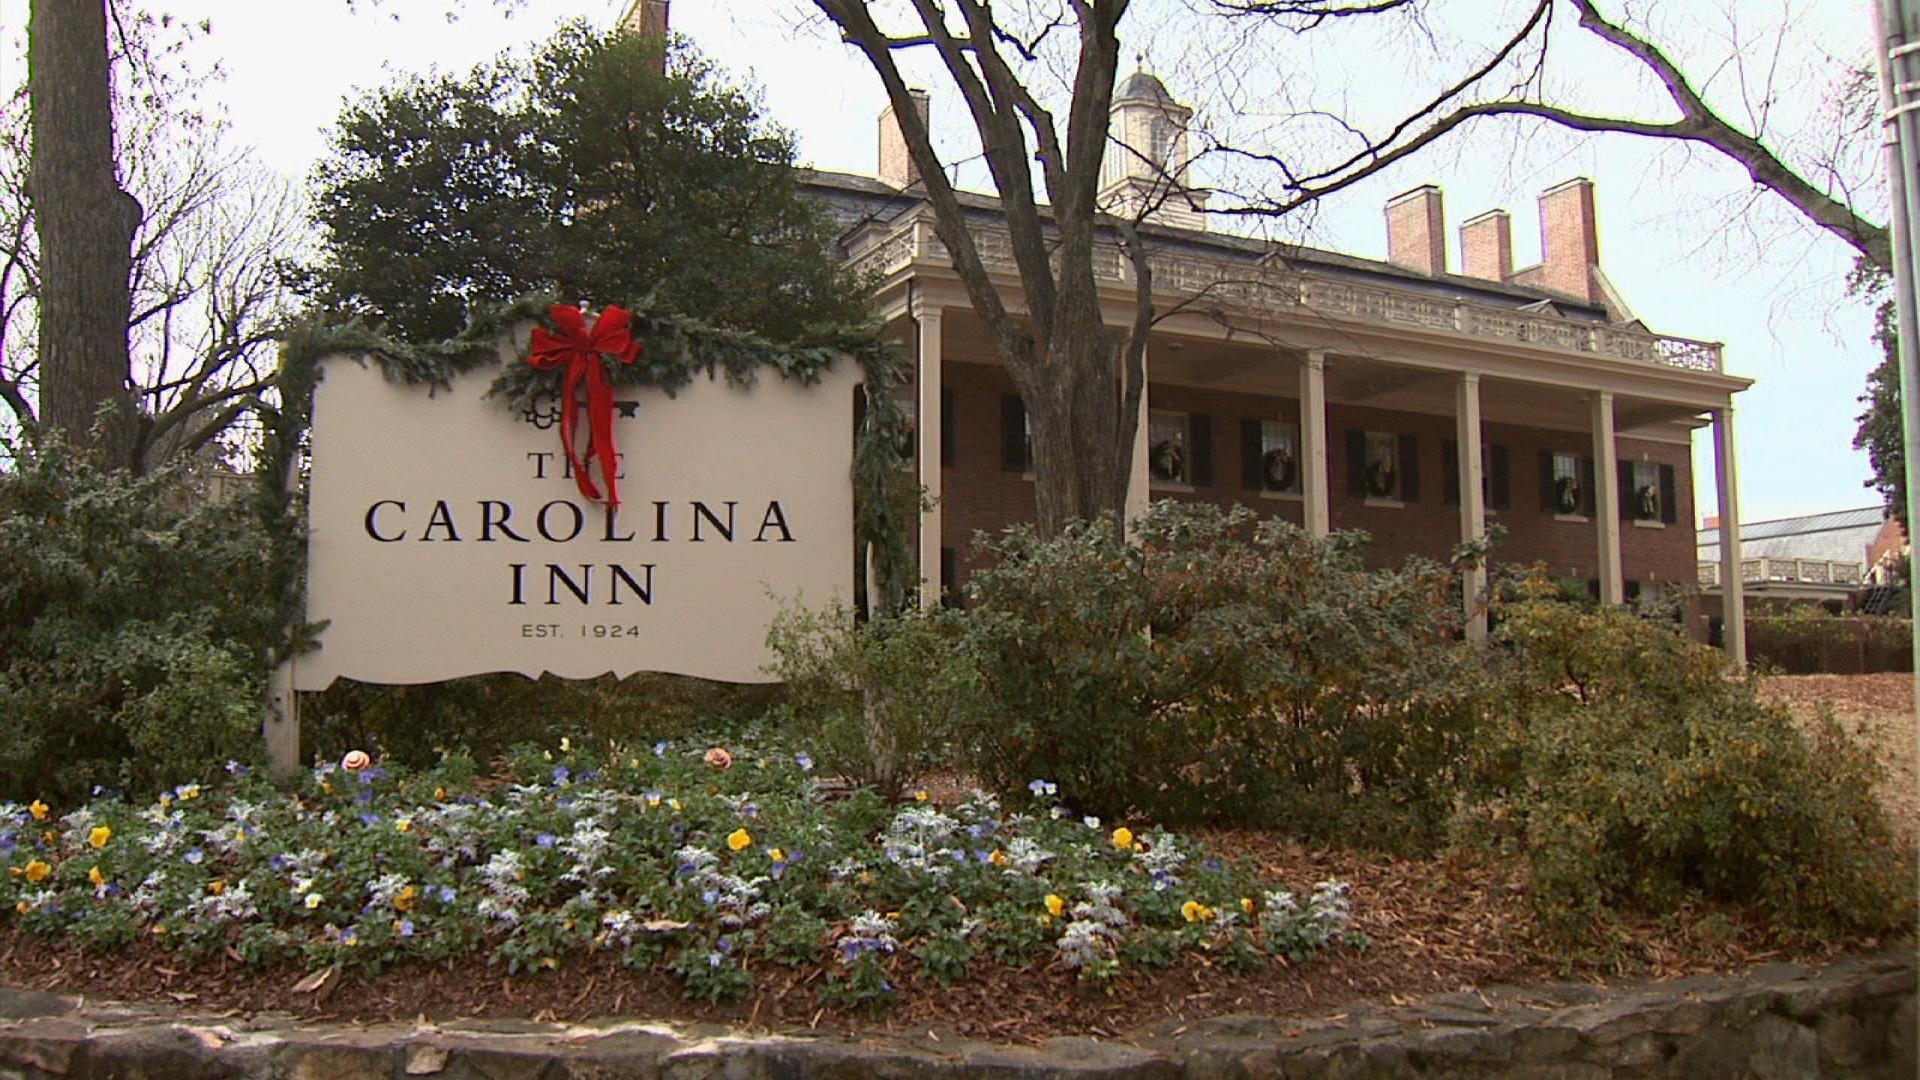 Carolina Inn: Twelve Days of Christmas image